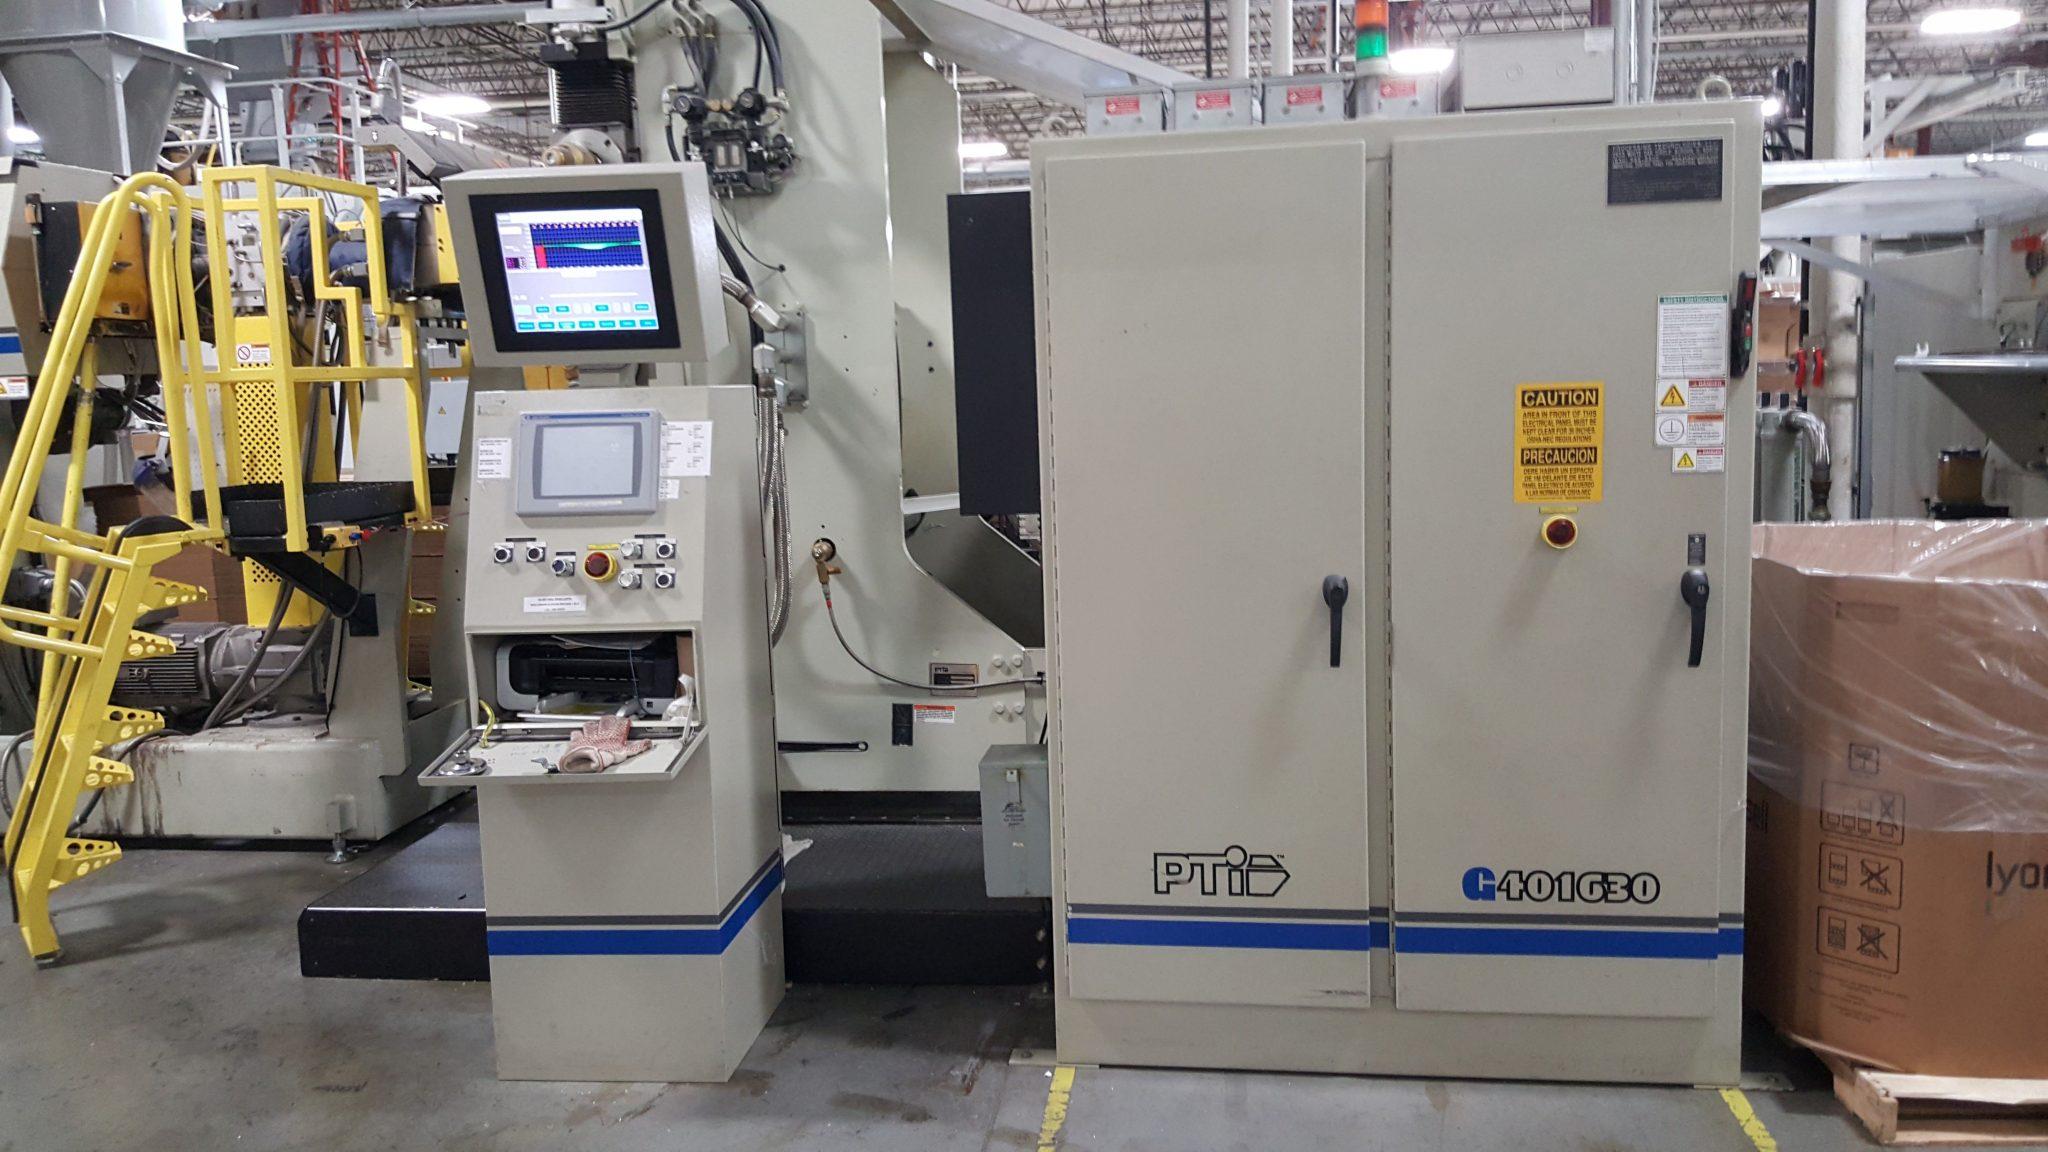 20170812_091740-compressor